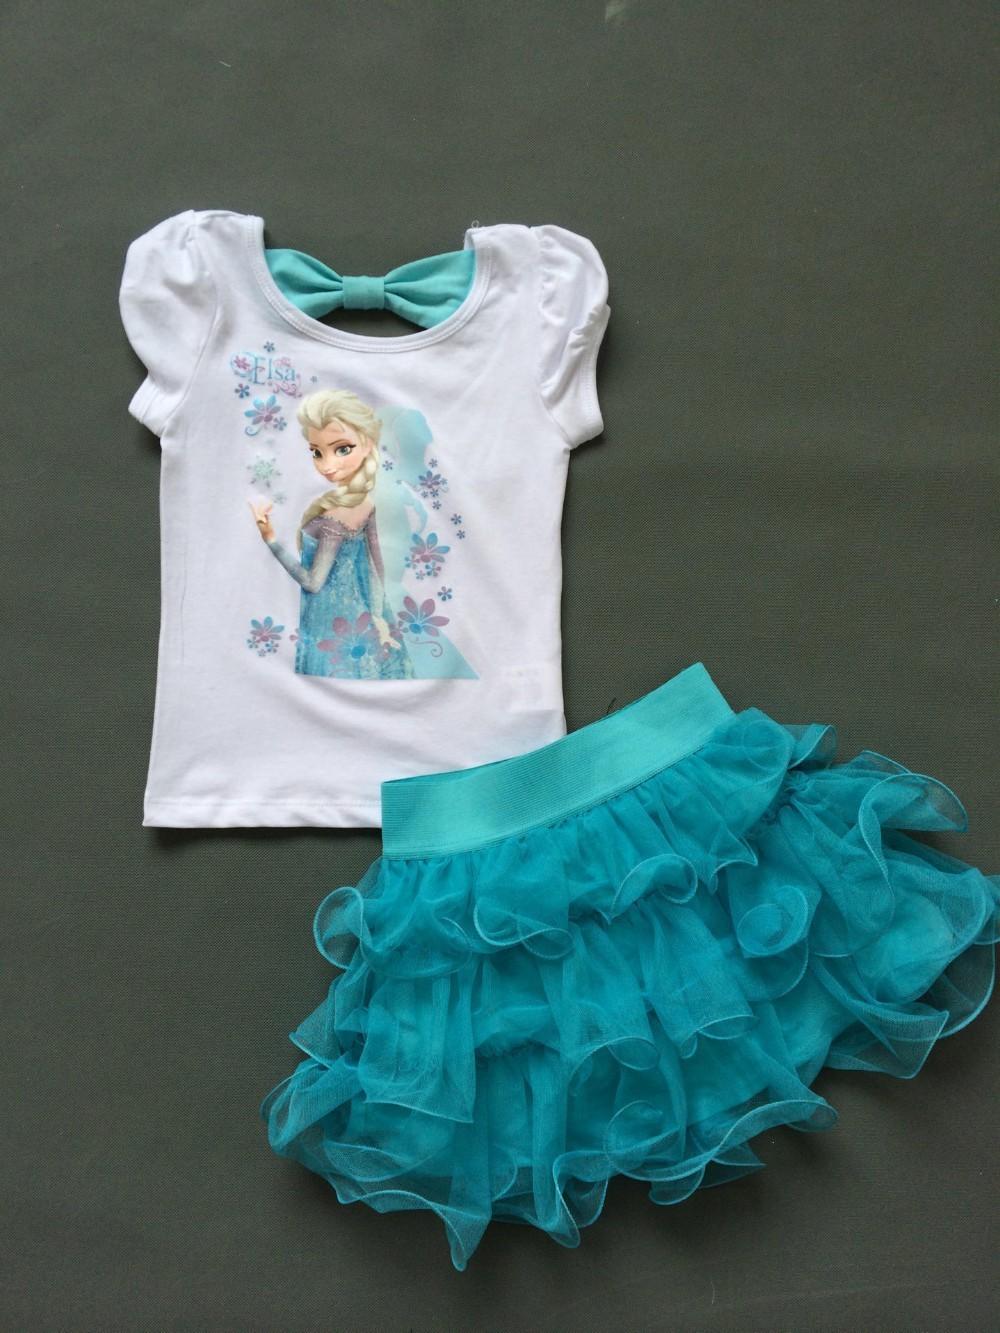 Girls Dress Princess Elsa Dress + T shirt 2 Pcs Set Sky Blue Layered Tutu Dress 3~8 year Party Clothing Sets Girl ADTZ015(China (Mainland))